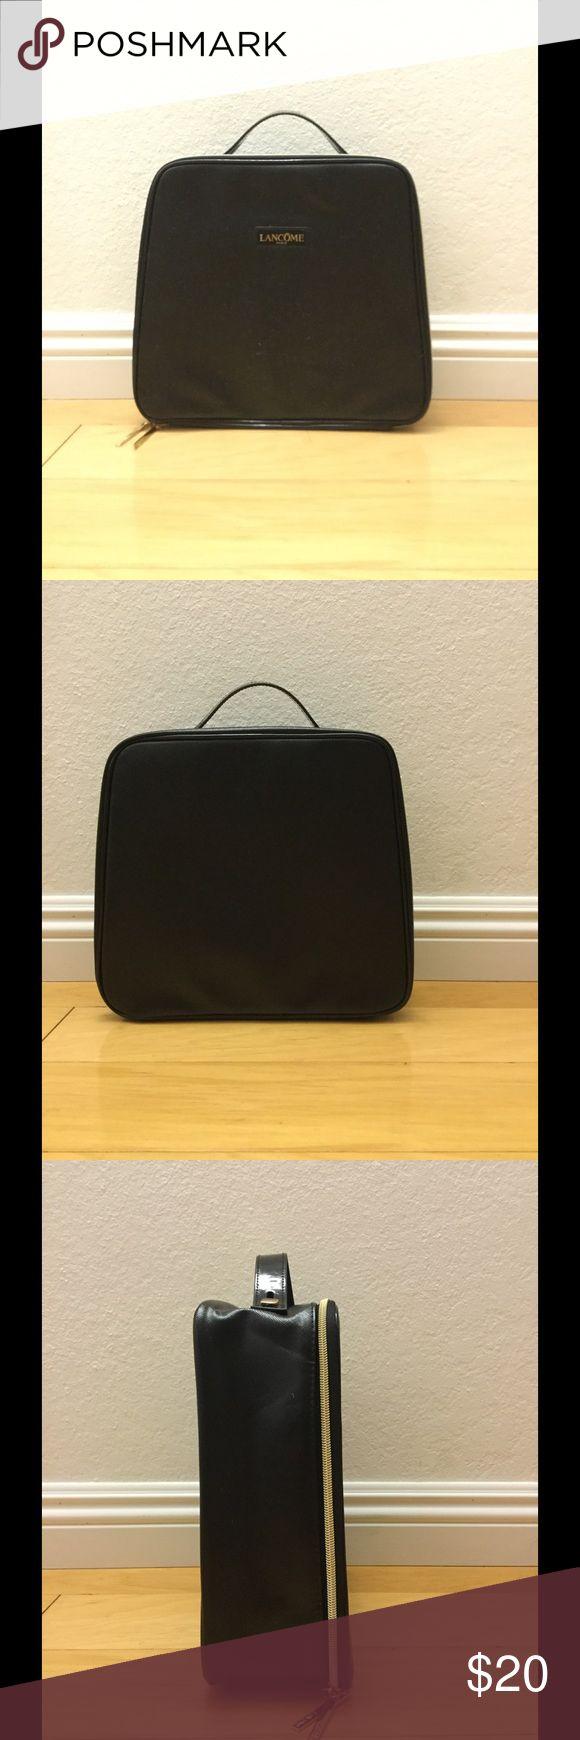 Lancôme black makeup bag NWOT Lancôme black makeup bag NWOT - comes with a small pink makeup bag inside Lancome Makeup